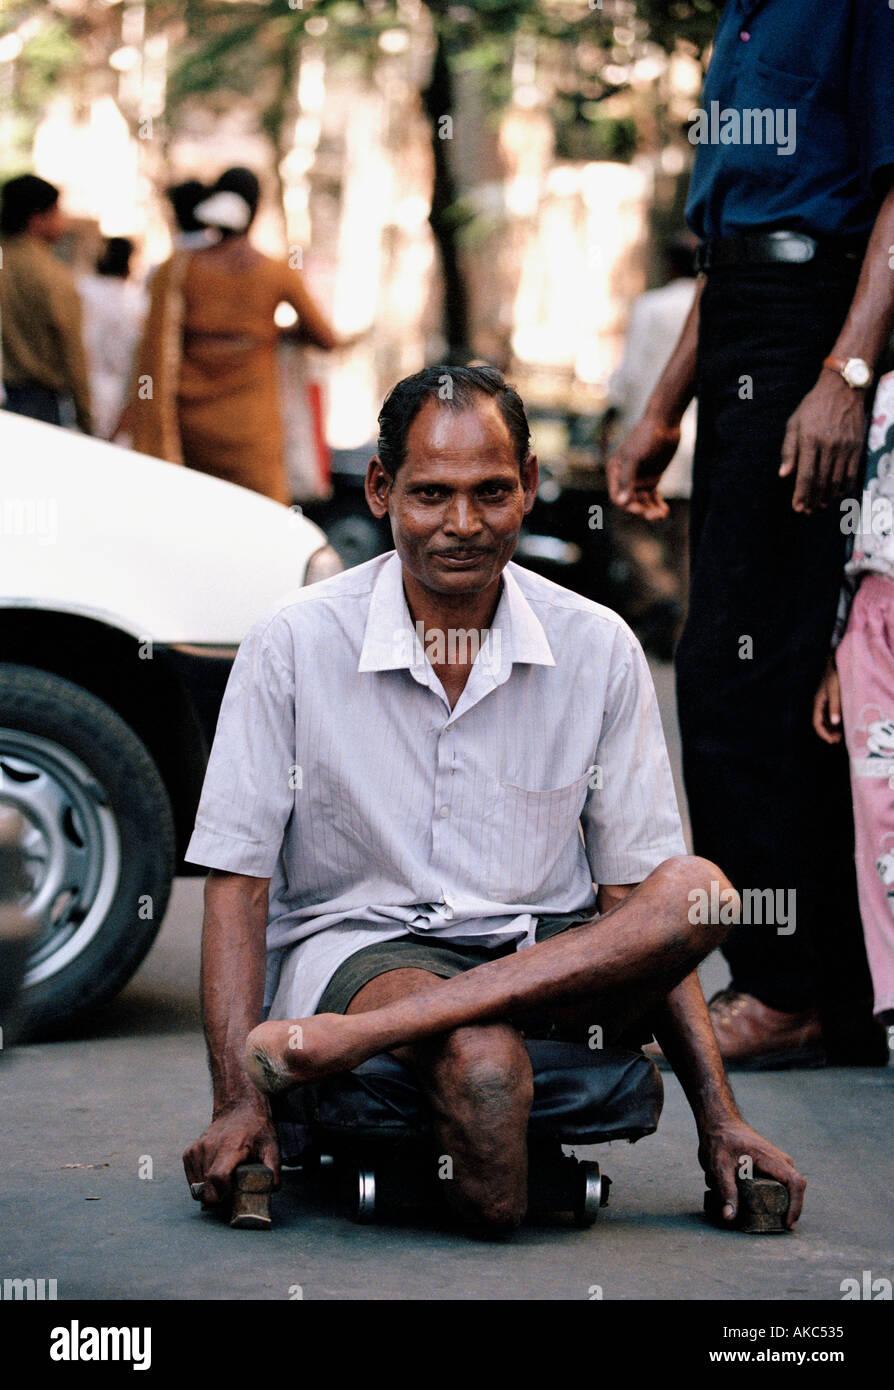 a leper in Bombay Mumbai india - Stock Image